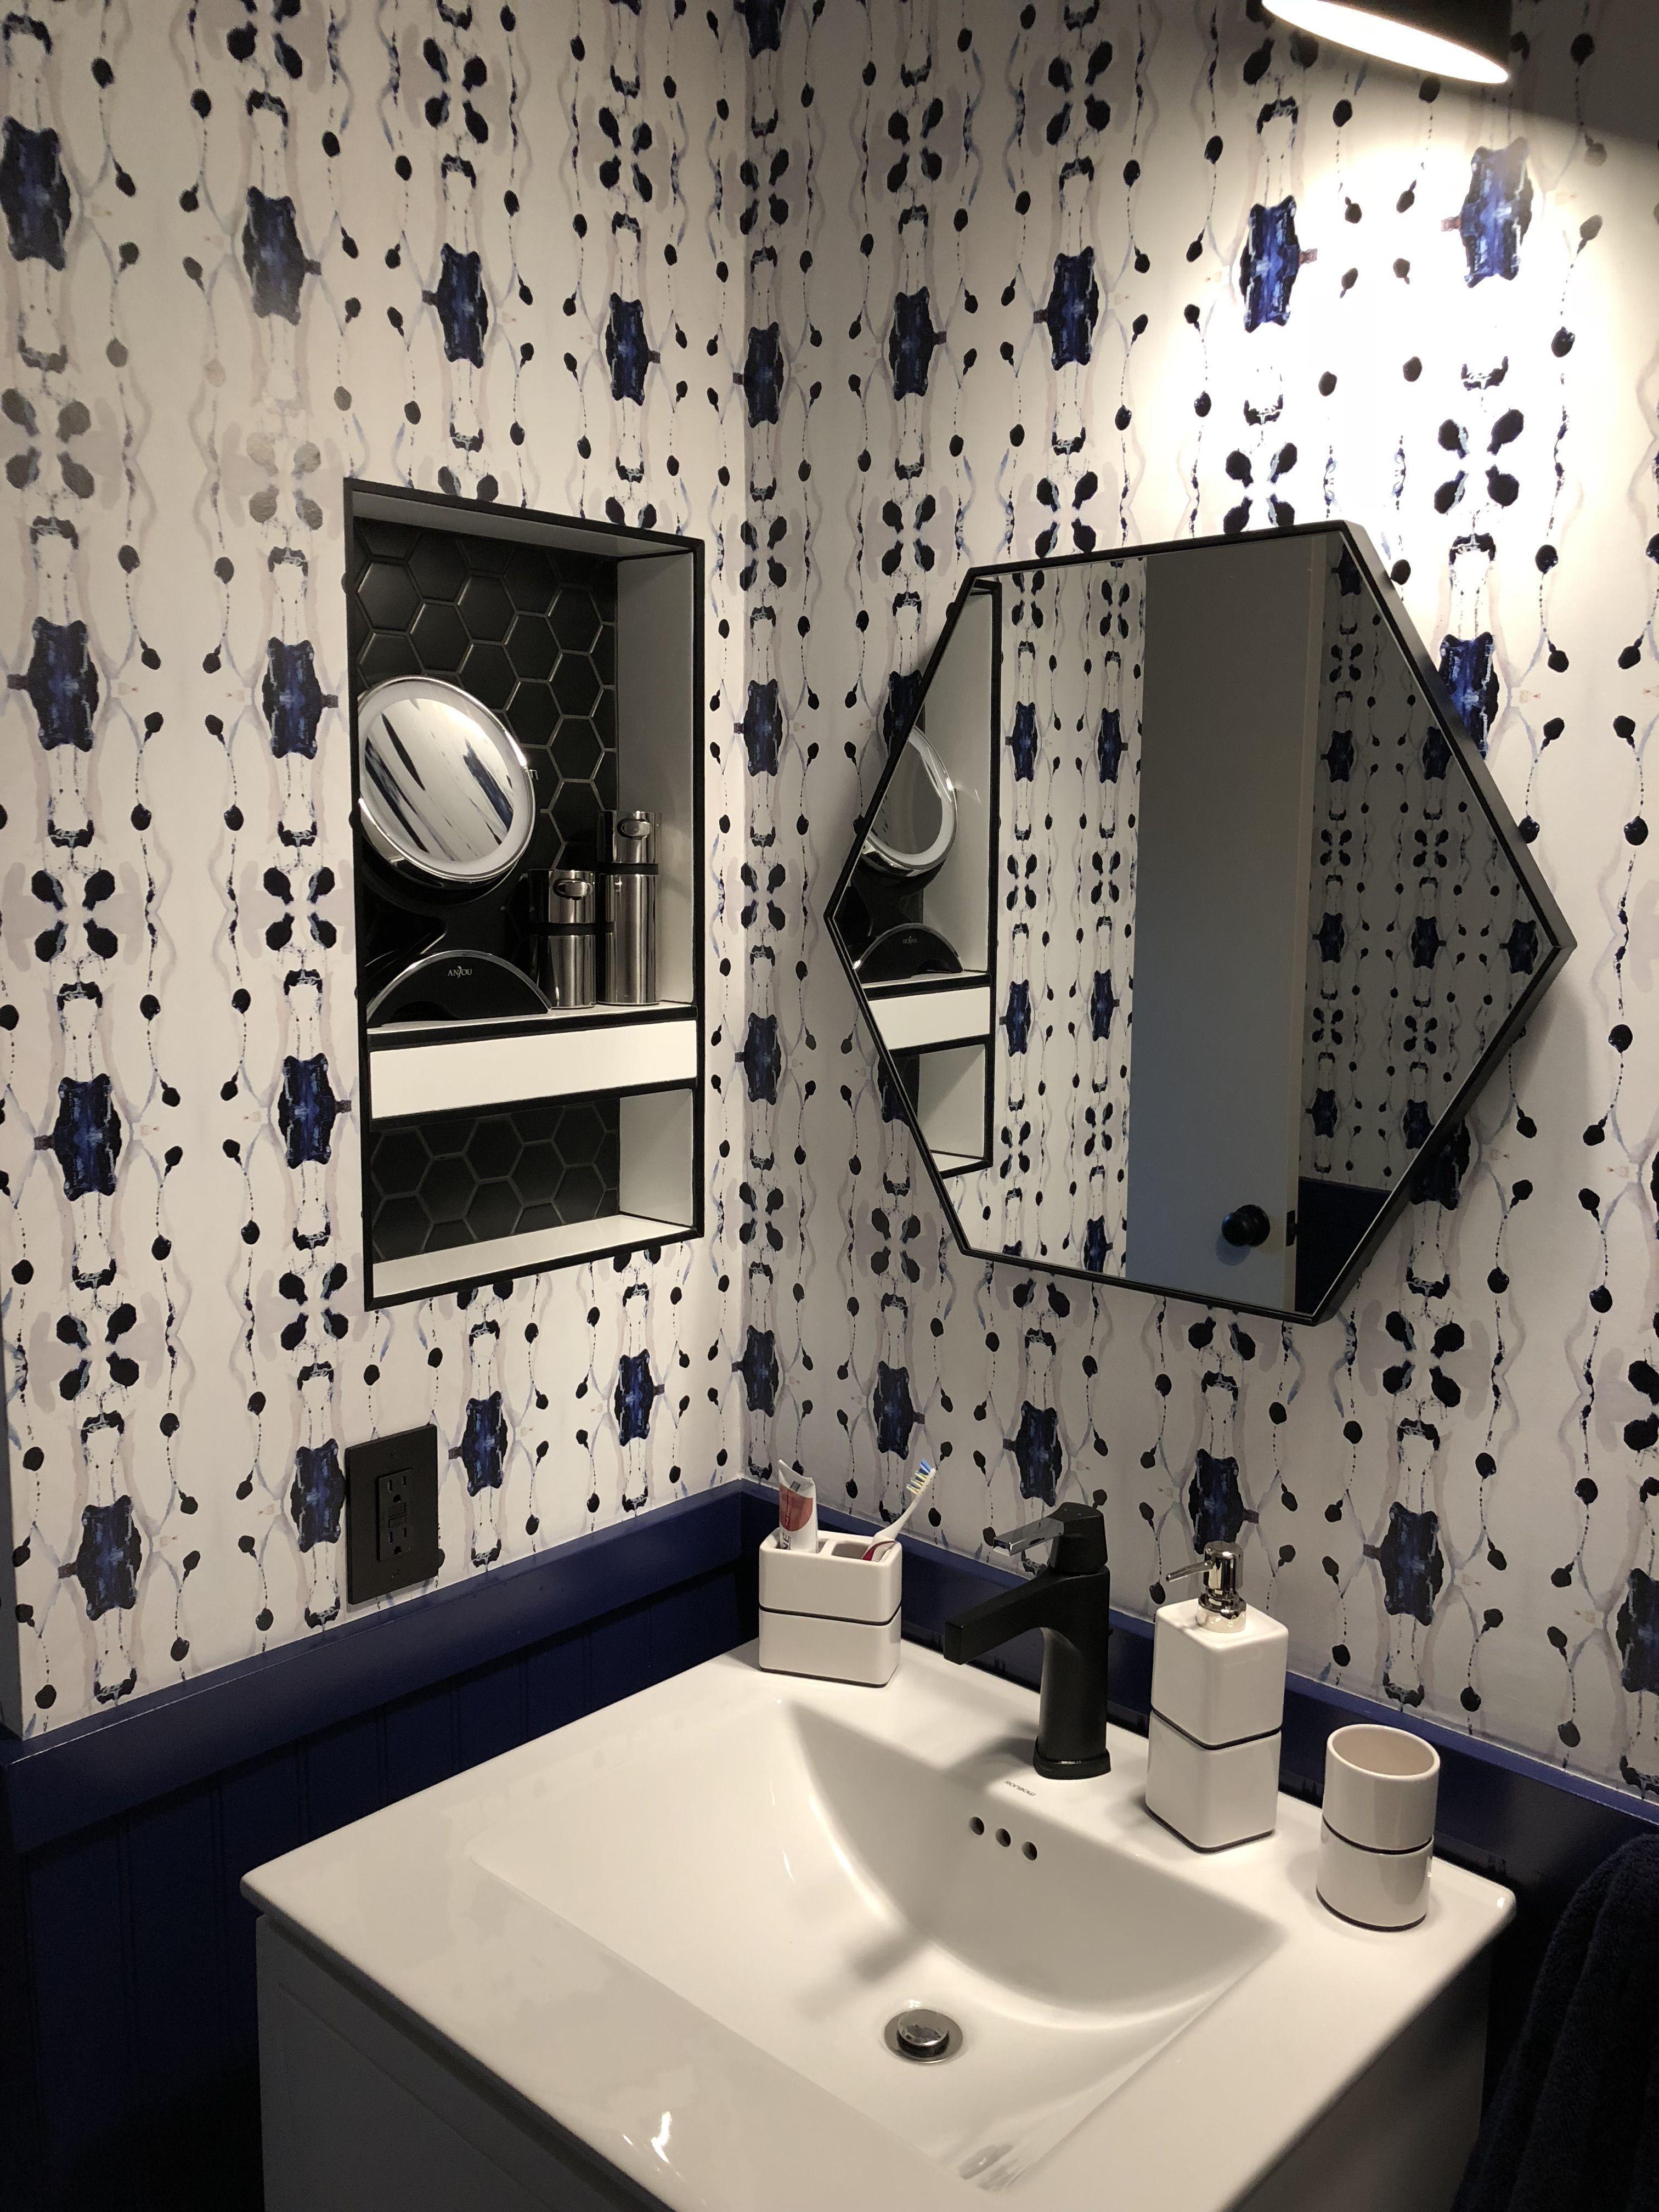 Powder room, navy wainscoting, Tamarindo wallpaper from Jennifer Latimer #PictureFrameWainscoting #WainscotingEntryway